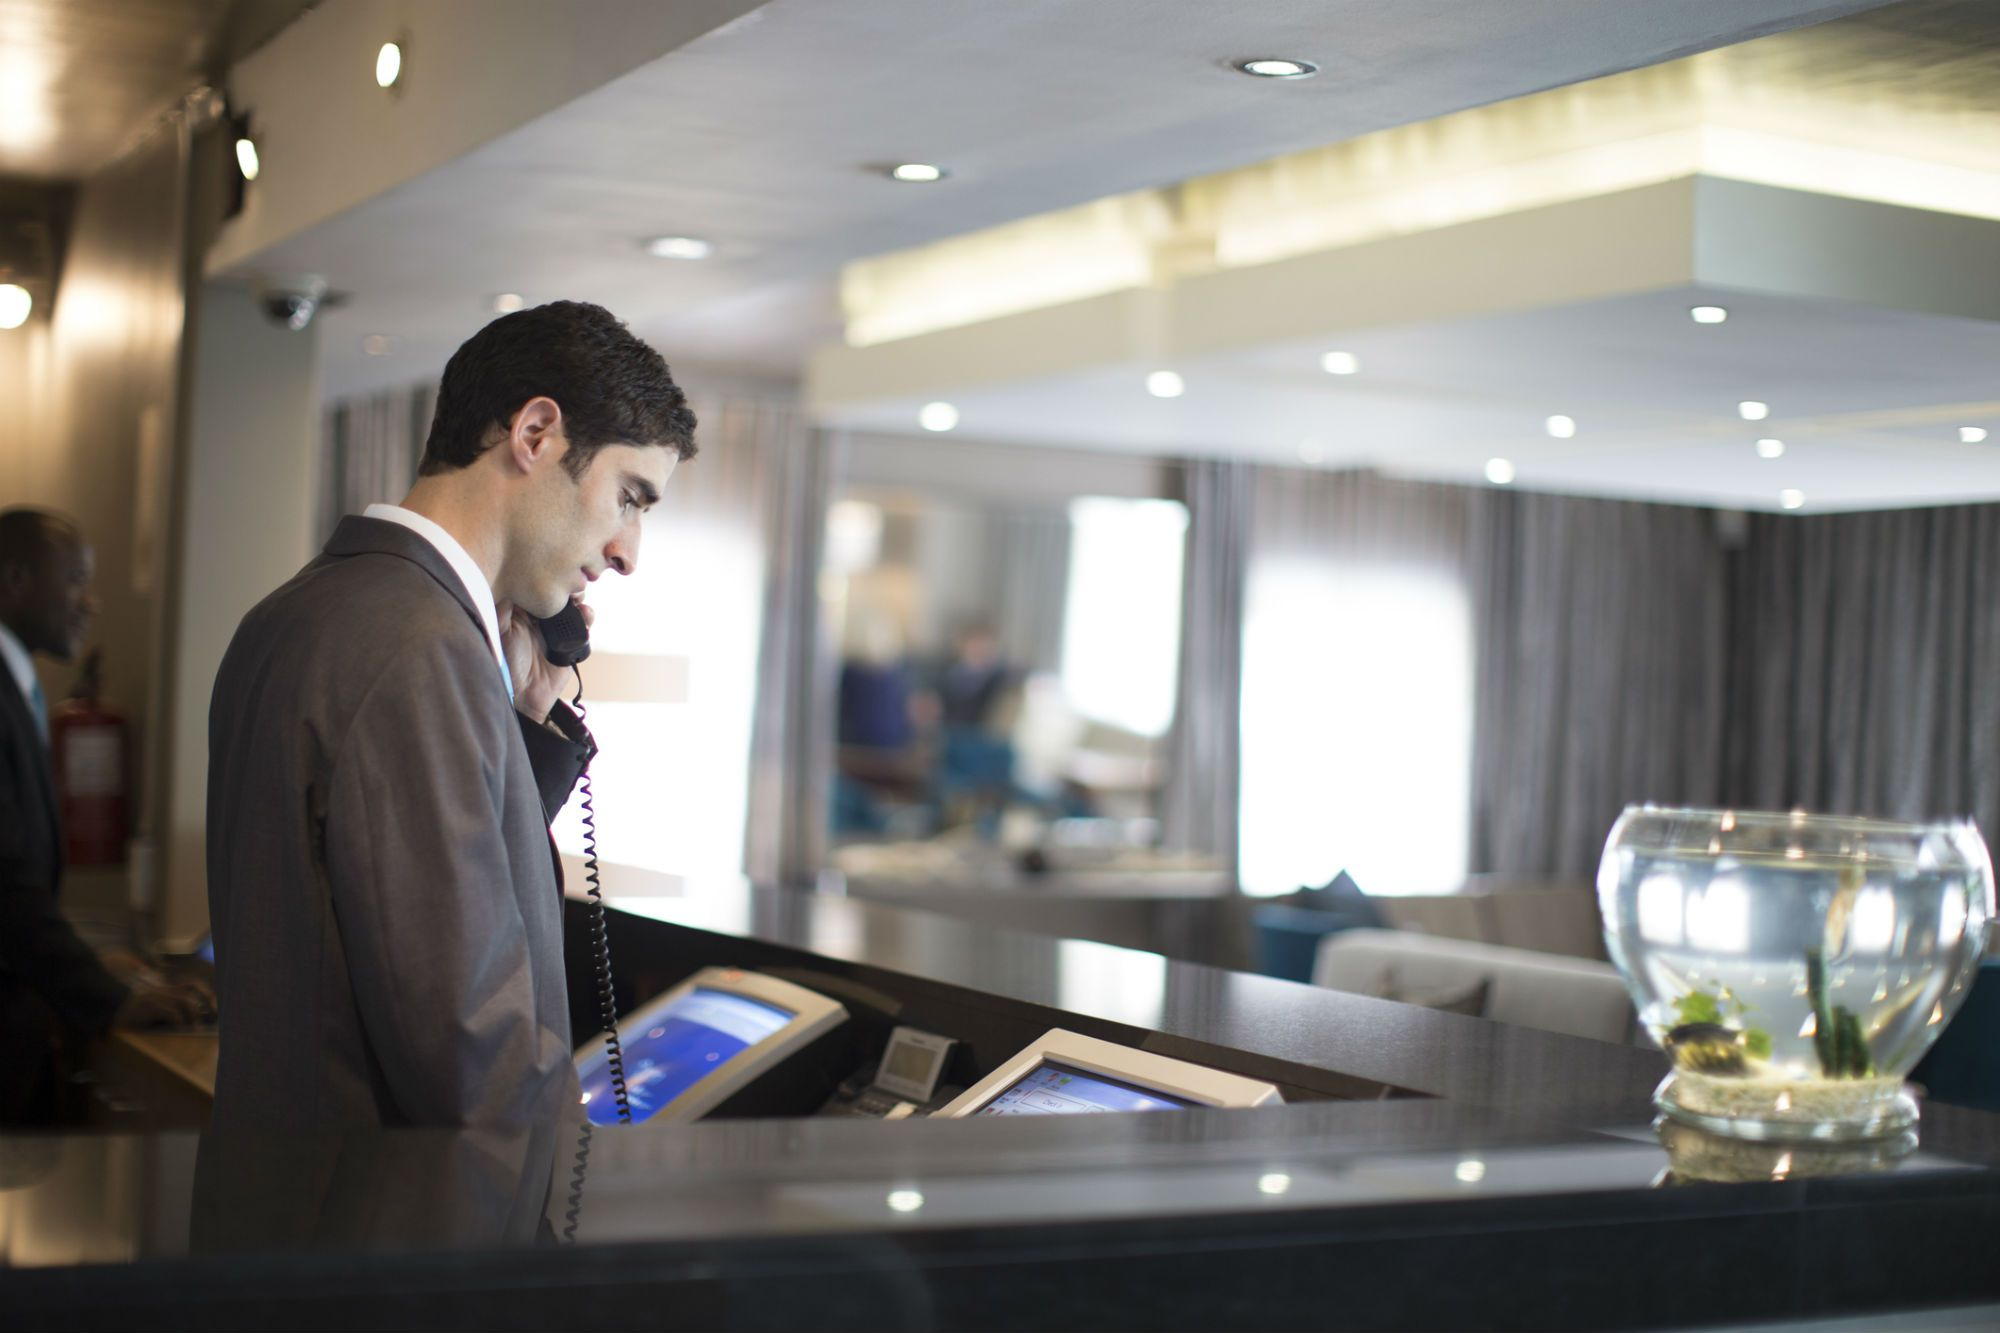 Office Jobs Hiring A Receptionist